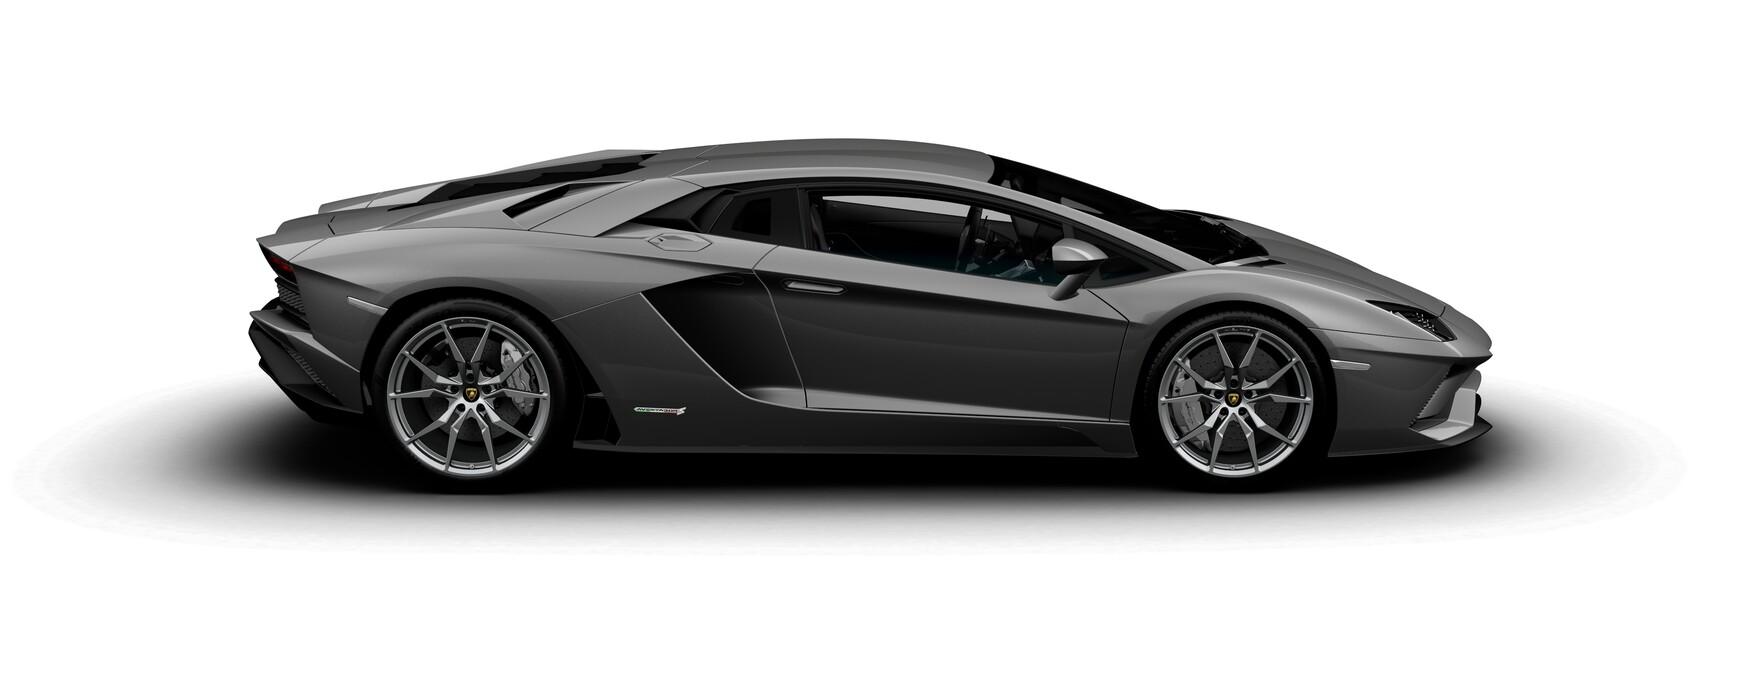 Lamborghini Aventador S Coupe metallic Grigio Estoque side view